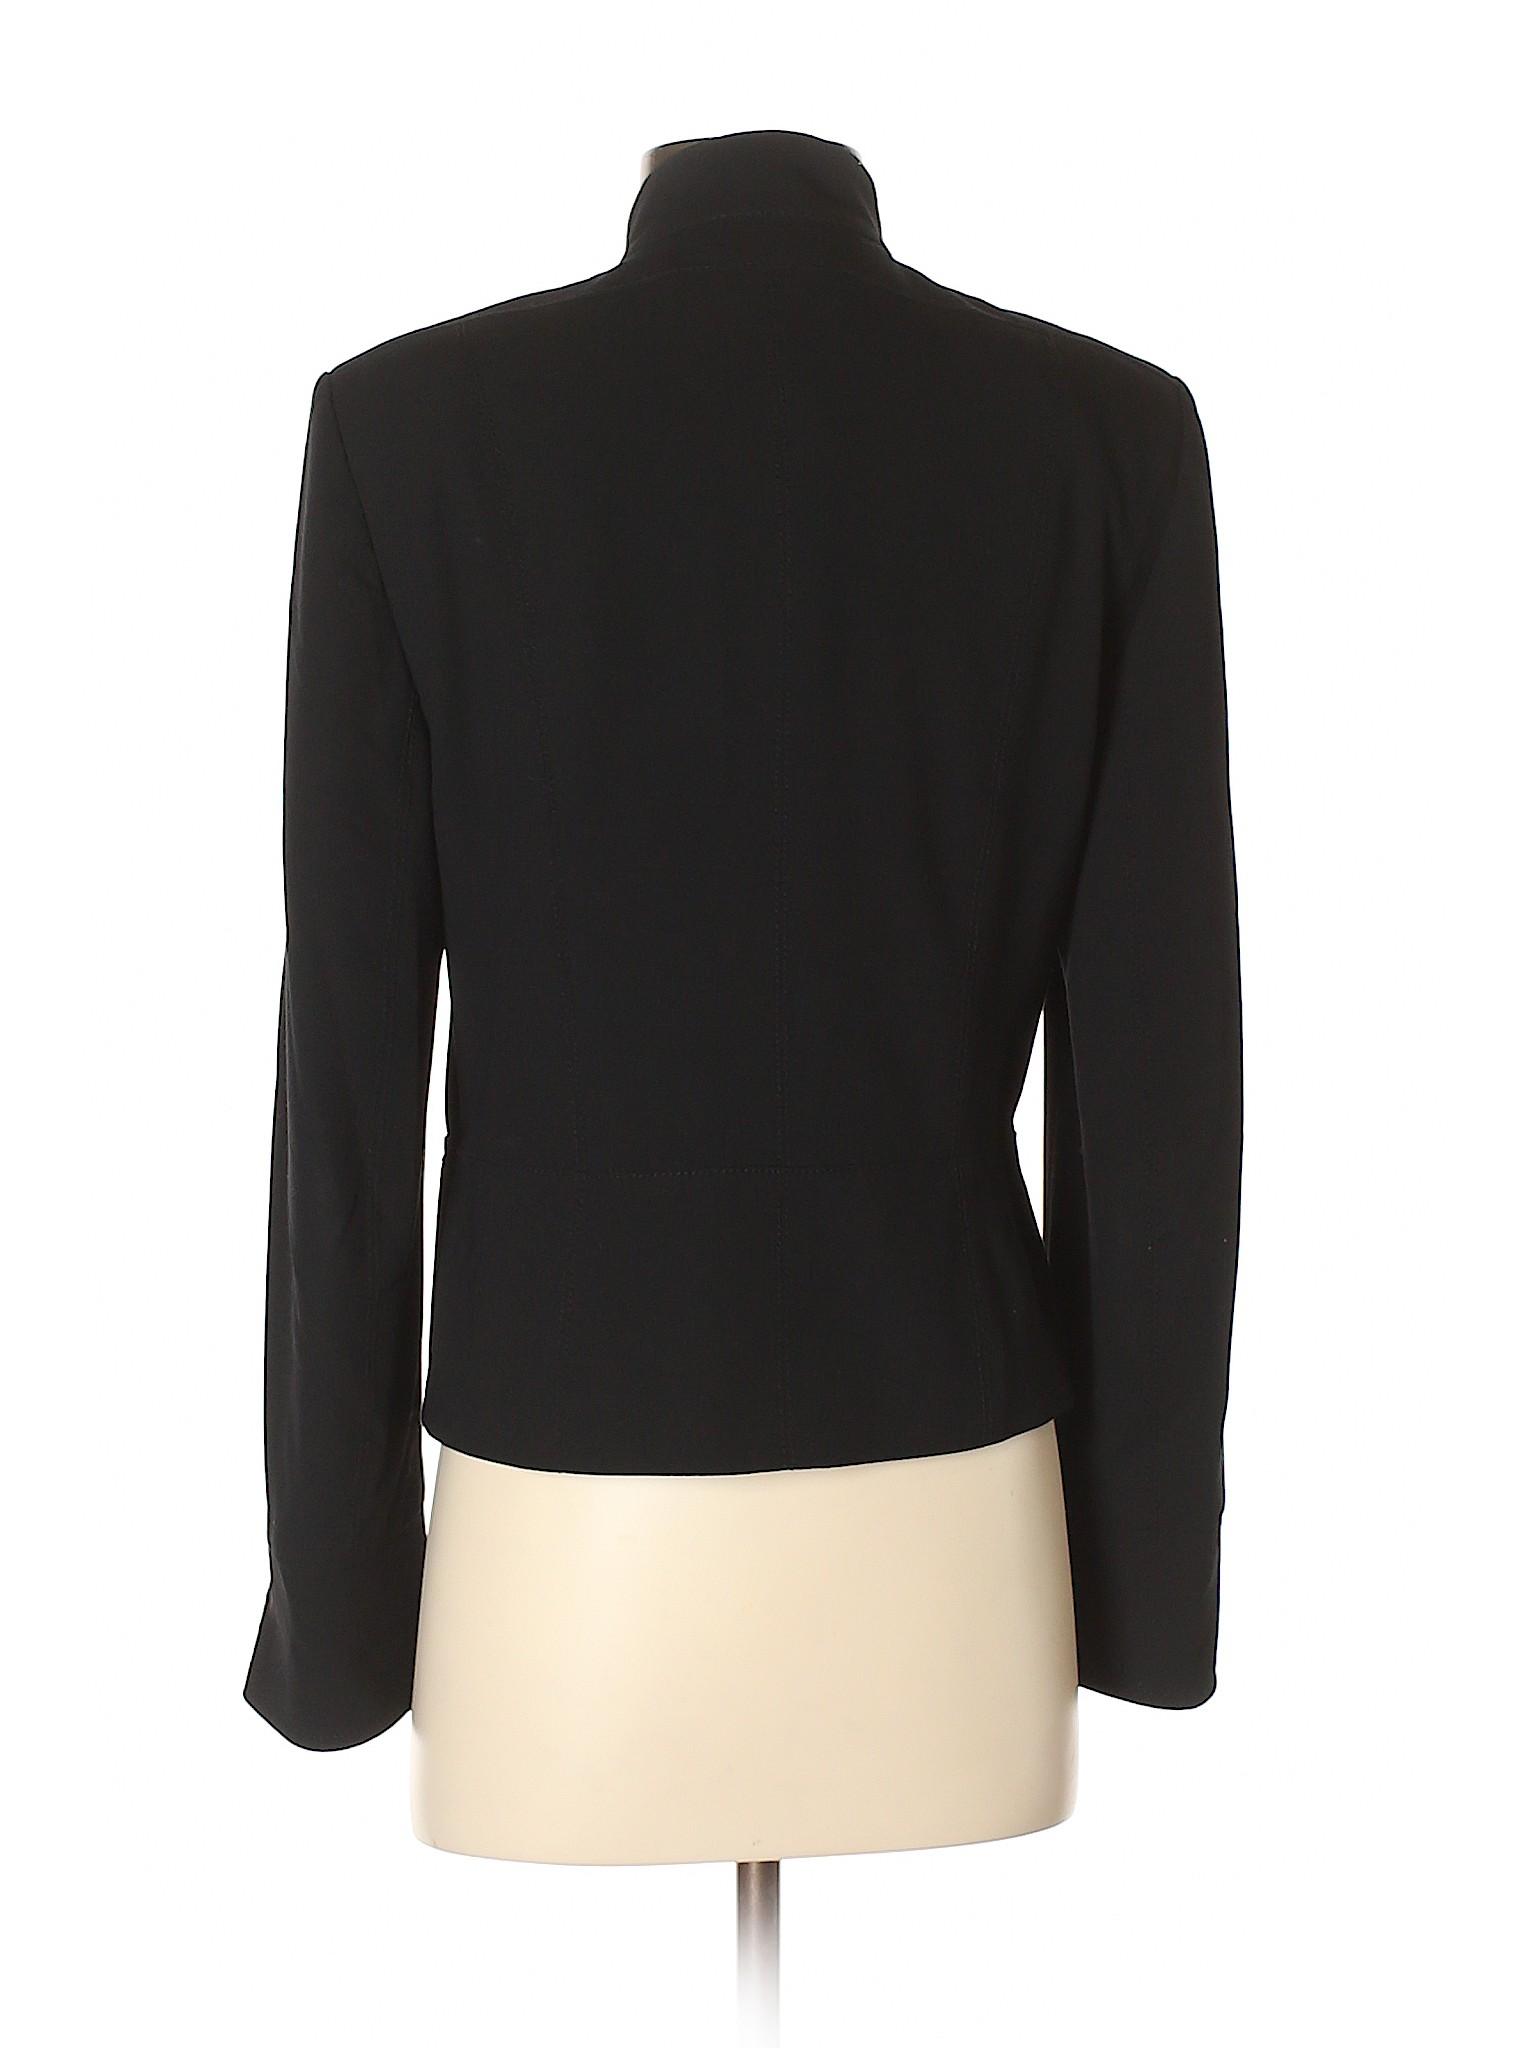 Boutique winter Jacket Preston amp; York rrwqROxd